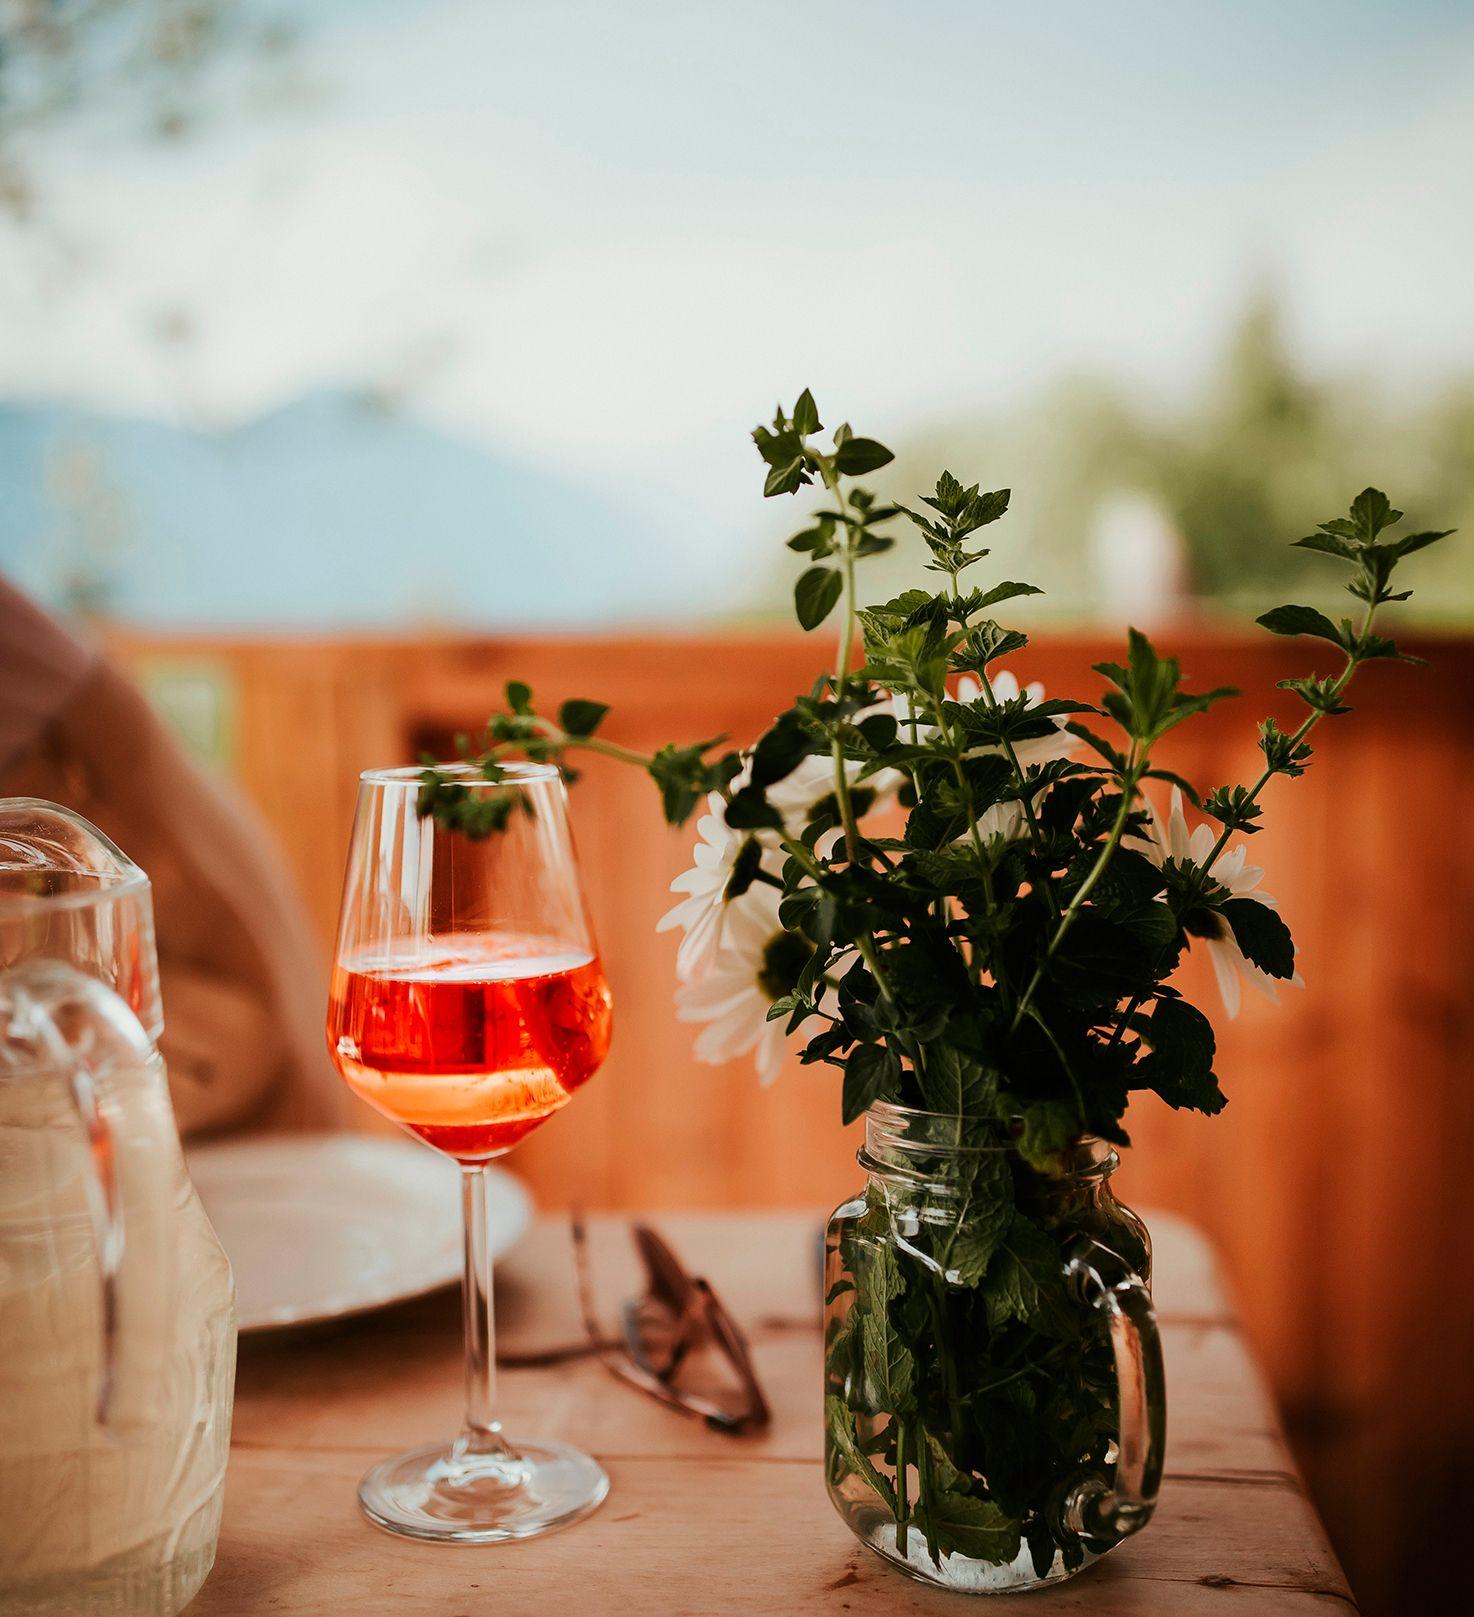 como mantener fresco el vino